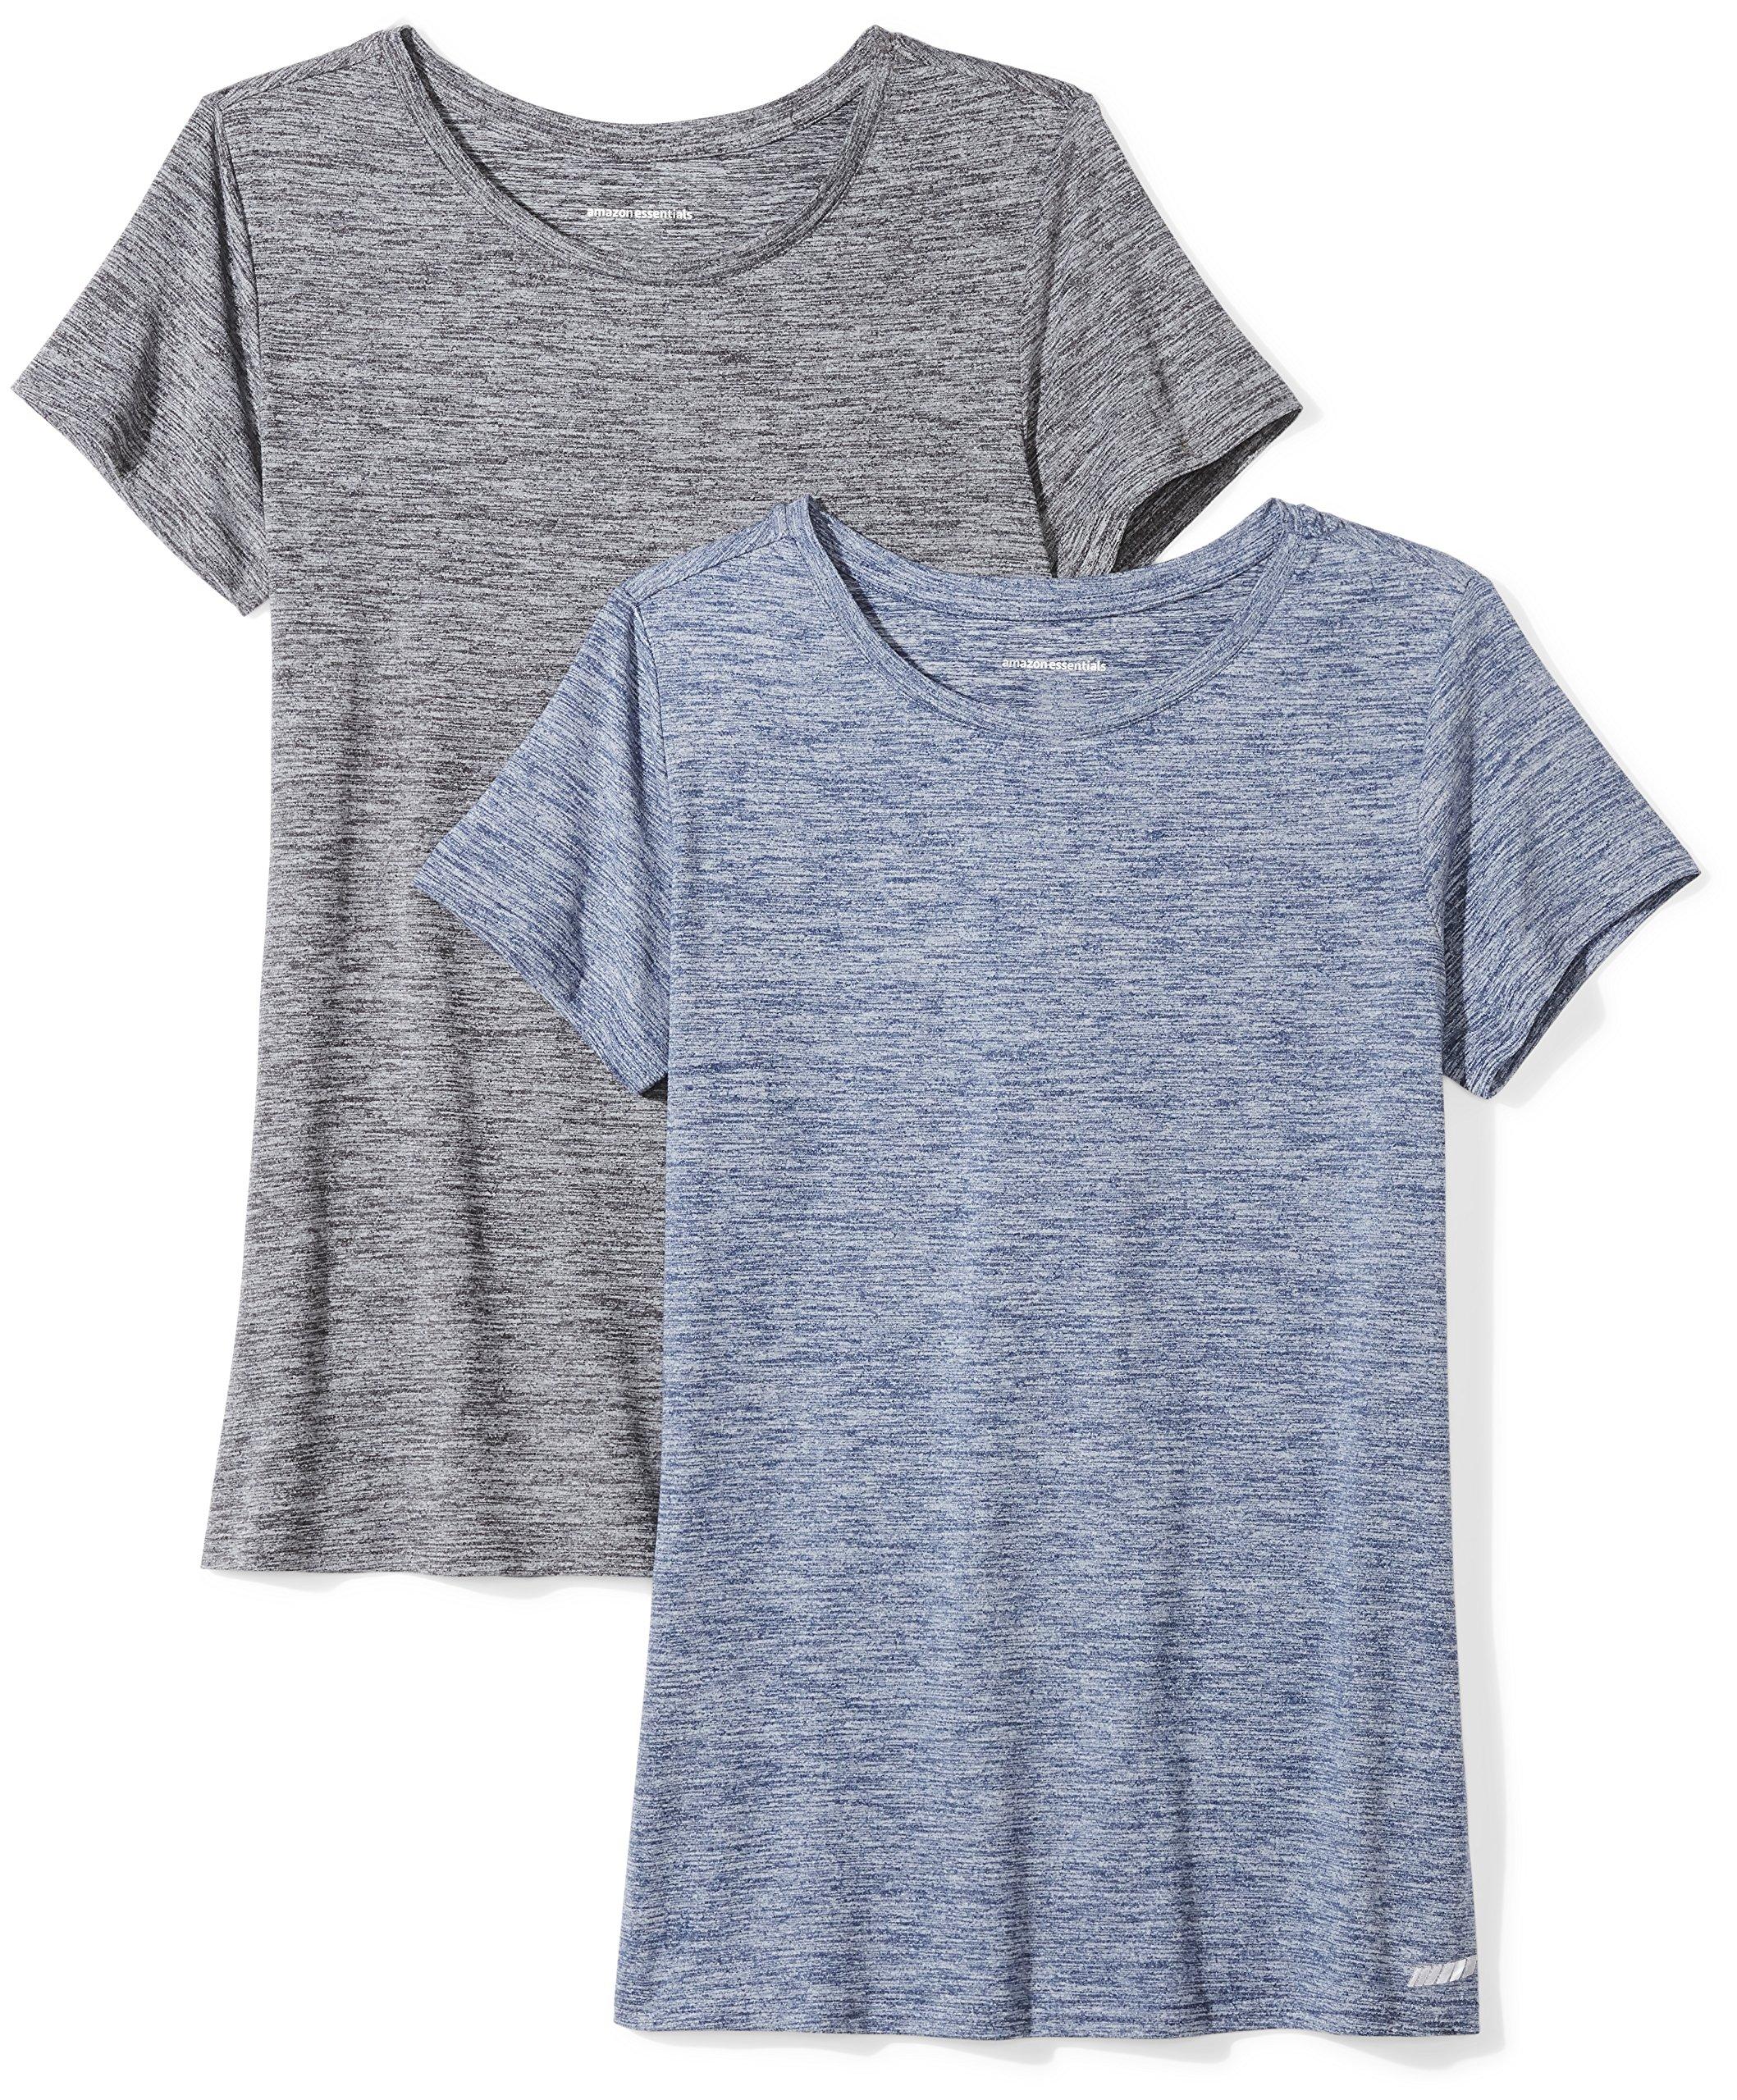 Amazon Essentials Women's 2-Pack Tech Stretch Short-Sleeve Crewneck T-Shirt, -black heather/navy heather, X-Large by Amazon Essentials